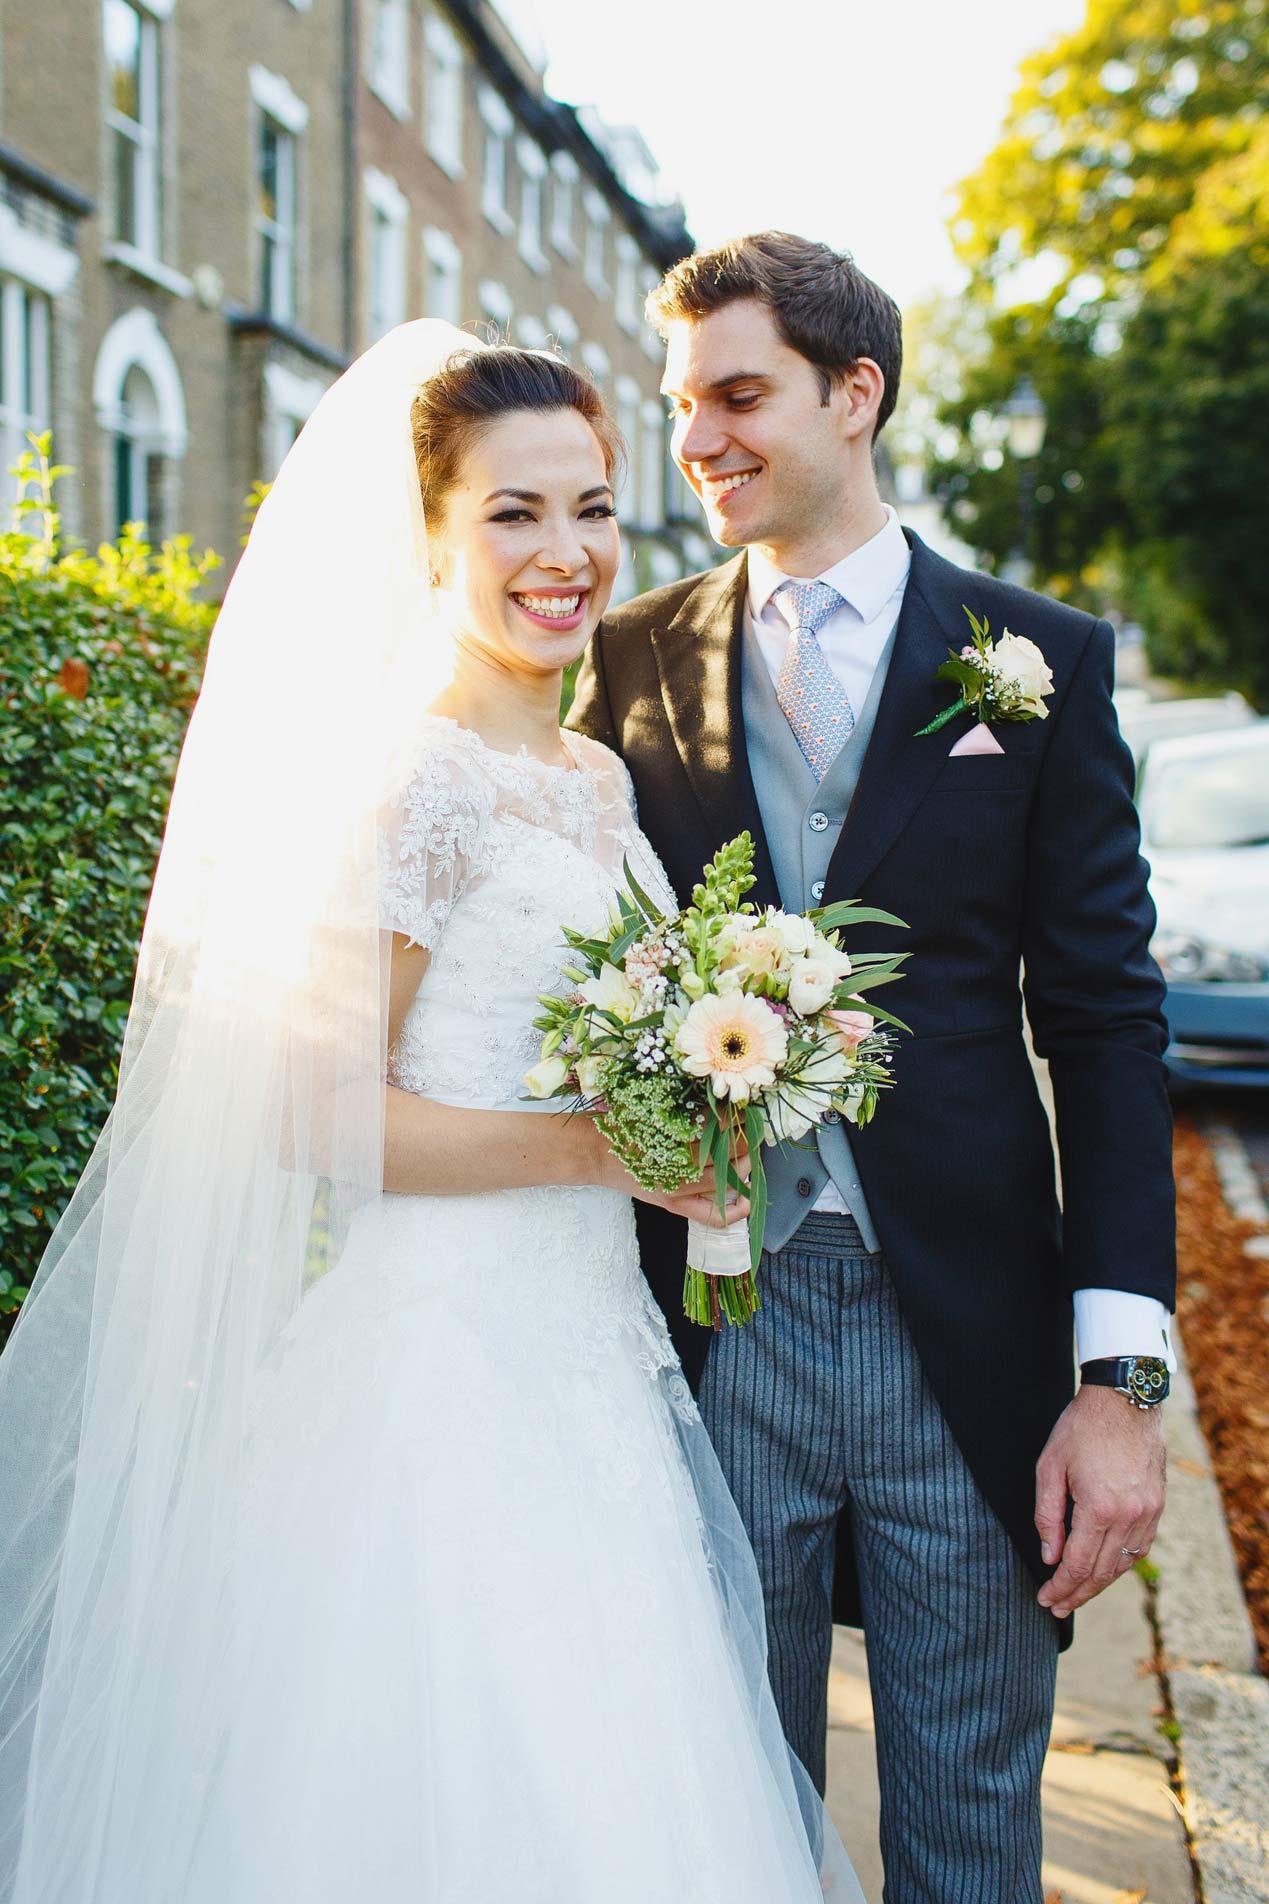 London_wedding_photographer_73